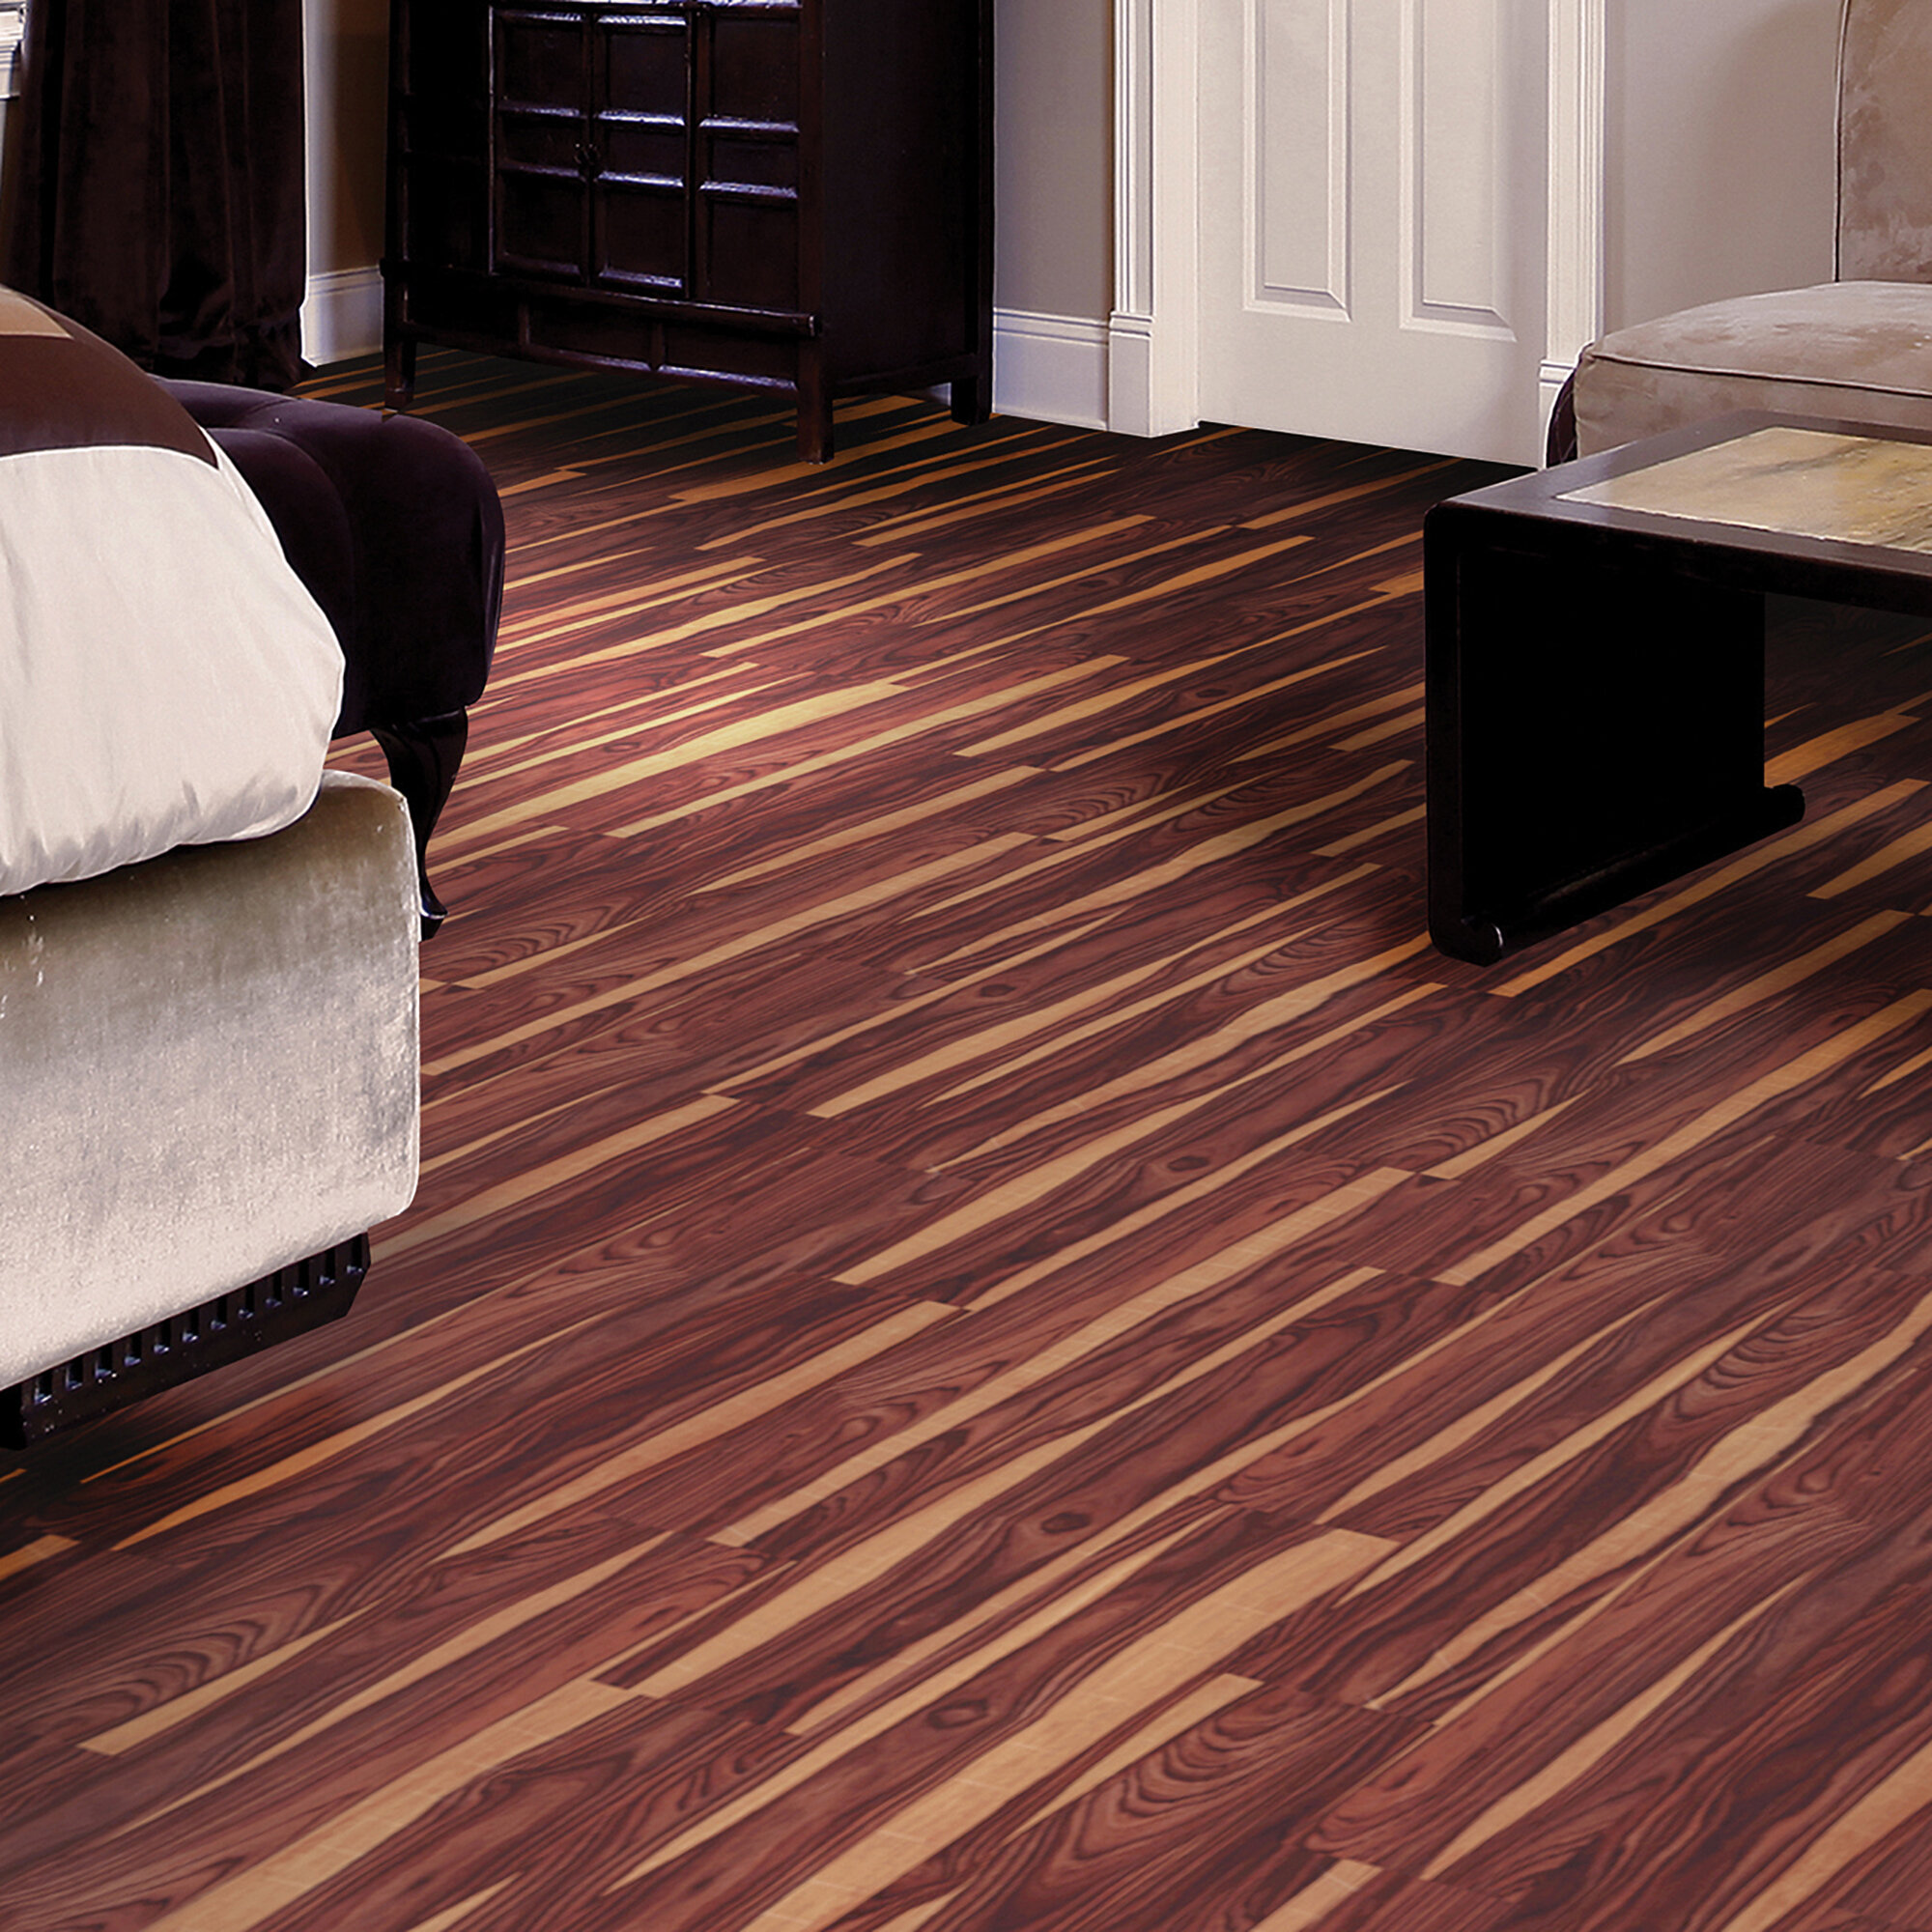 Allure Flooring Allure Gripstrip 6 X 36 X 3 8mm Luxury Vinyl Plank Reviews Wayfair